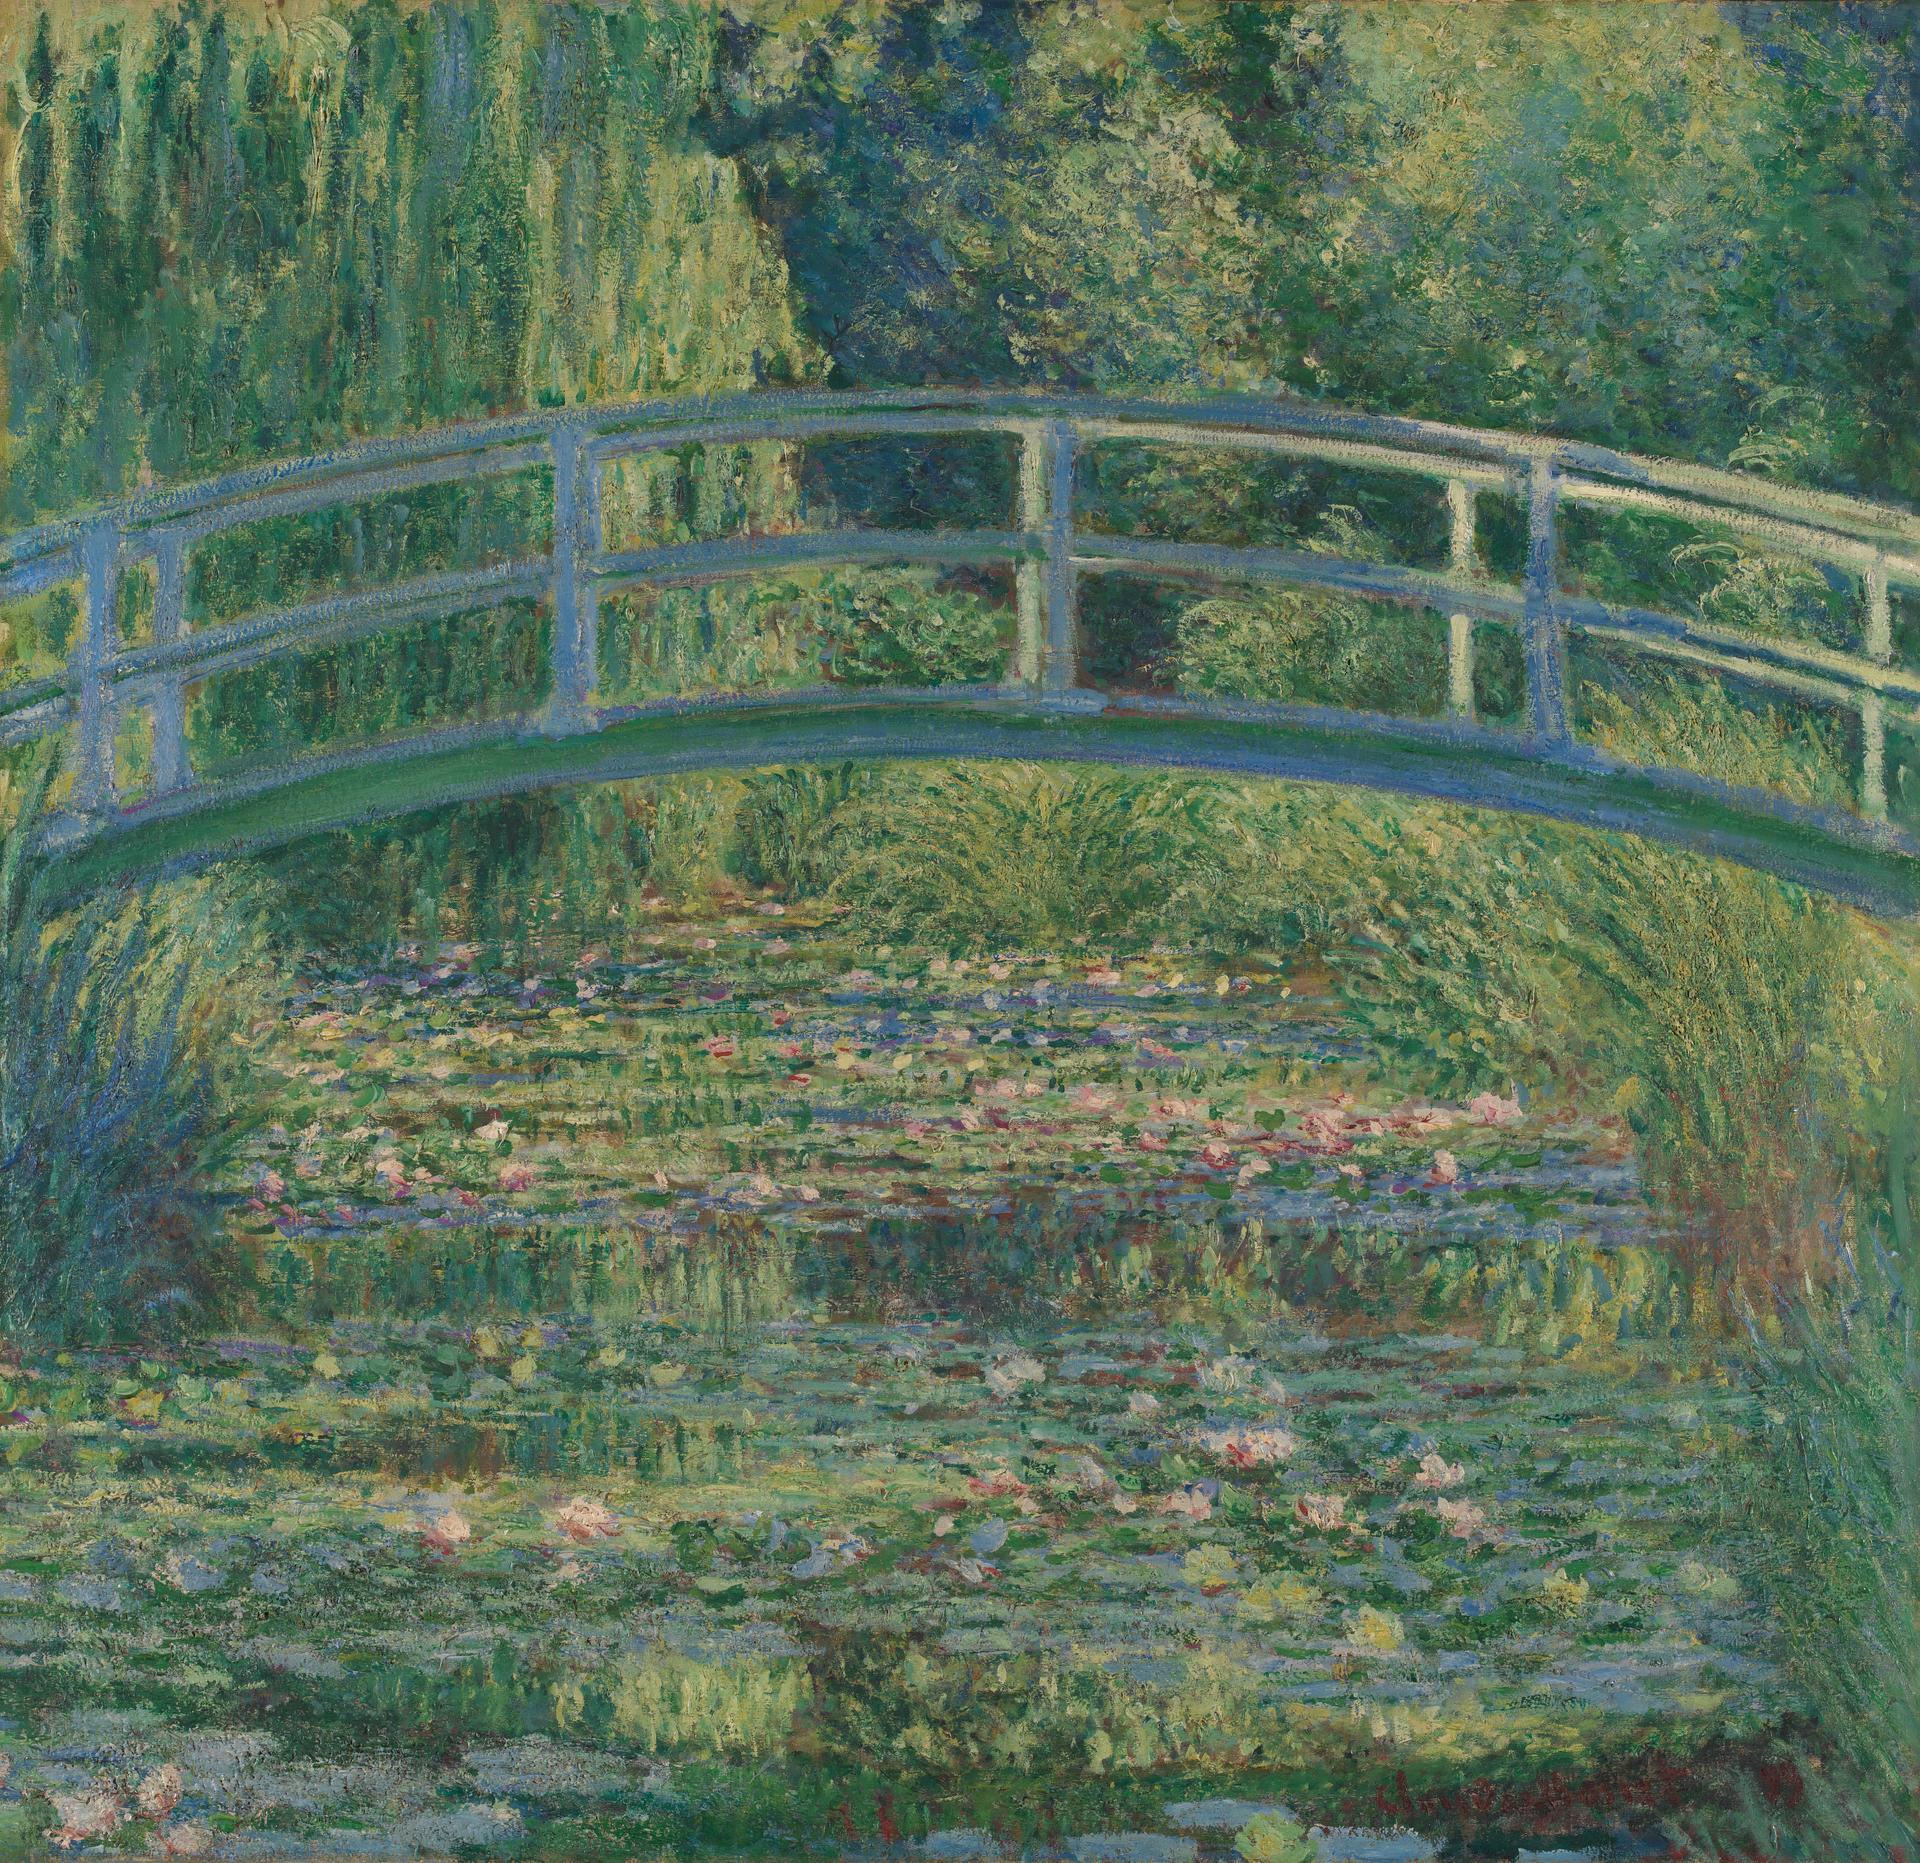 Pond original painting Monet style Artwork,Summer landscape with a bridge